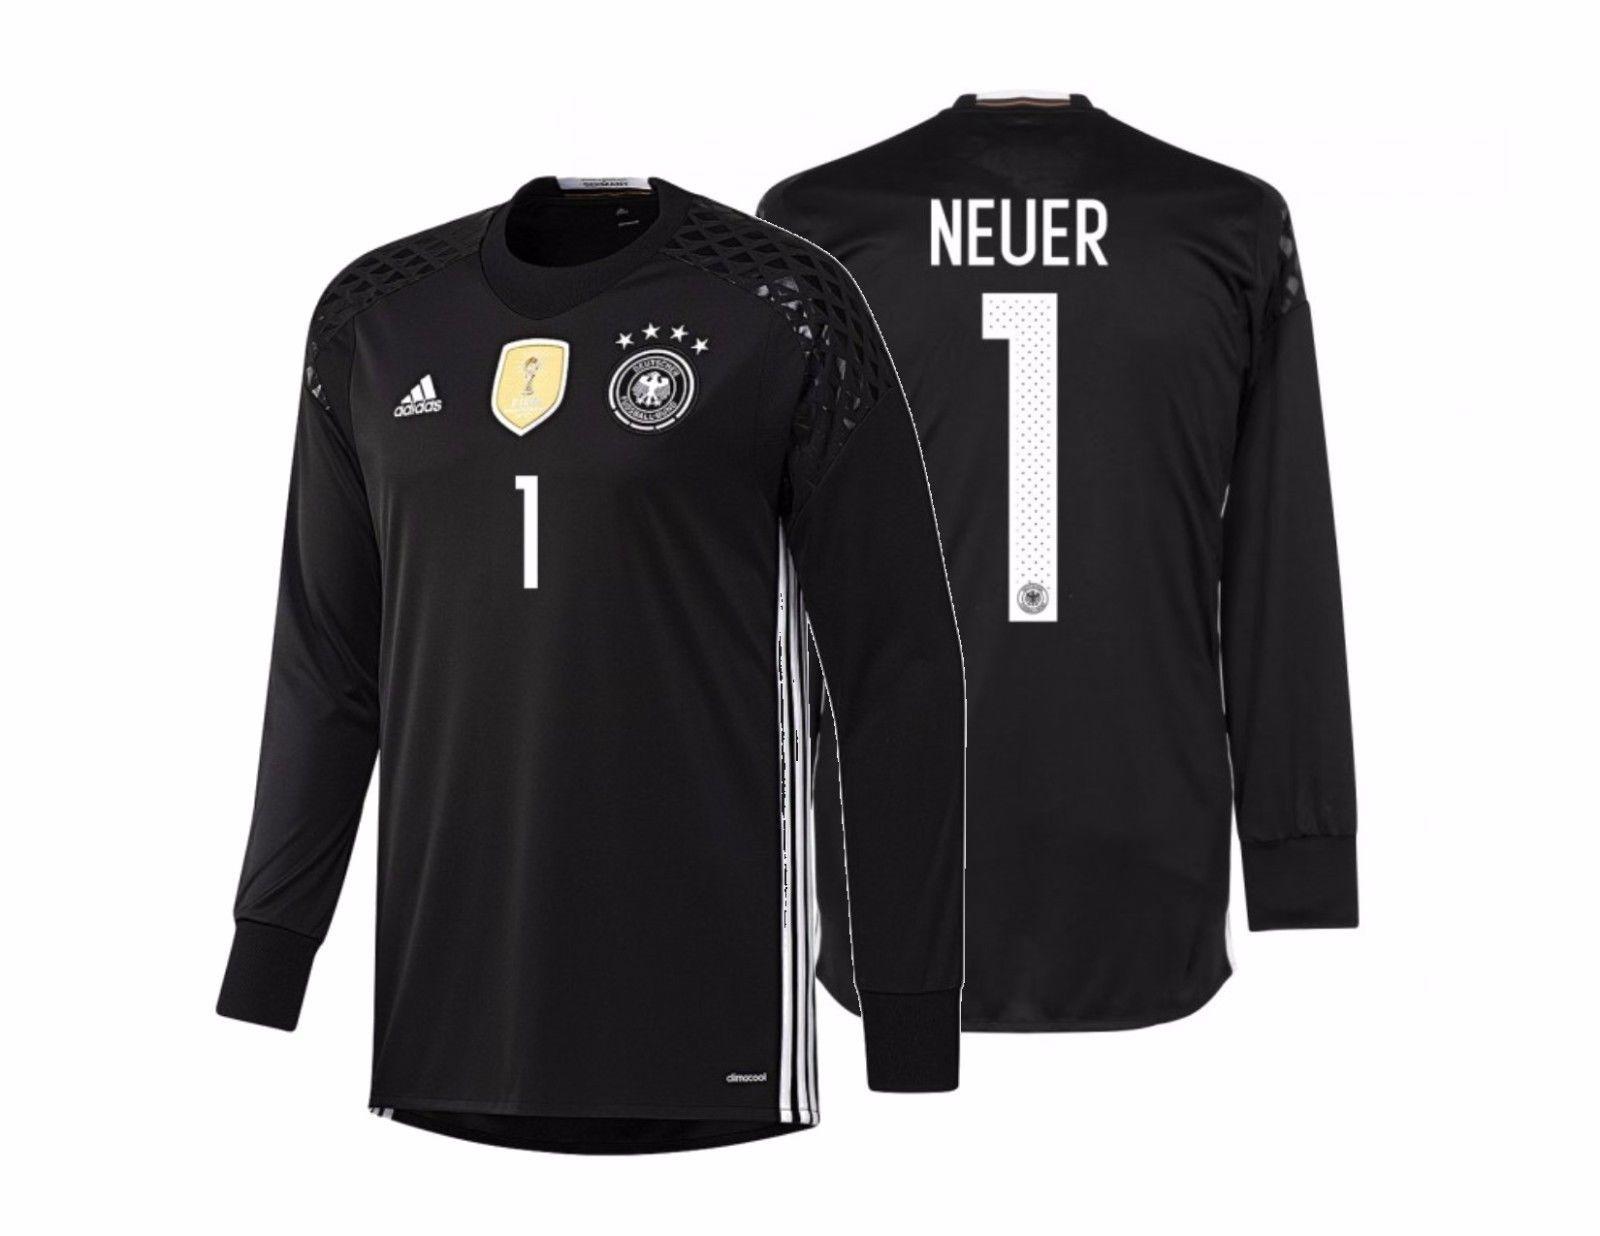 57. 57. Previous. ADIDAS MANUEL NEUER GERMANY EURO 2016 GOALKEEPER HOME  JERSEY Black White. ADIDAS MANUEL NEUER ... 7edb4968c